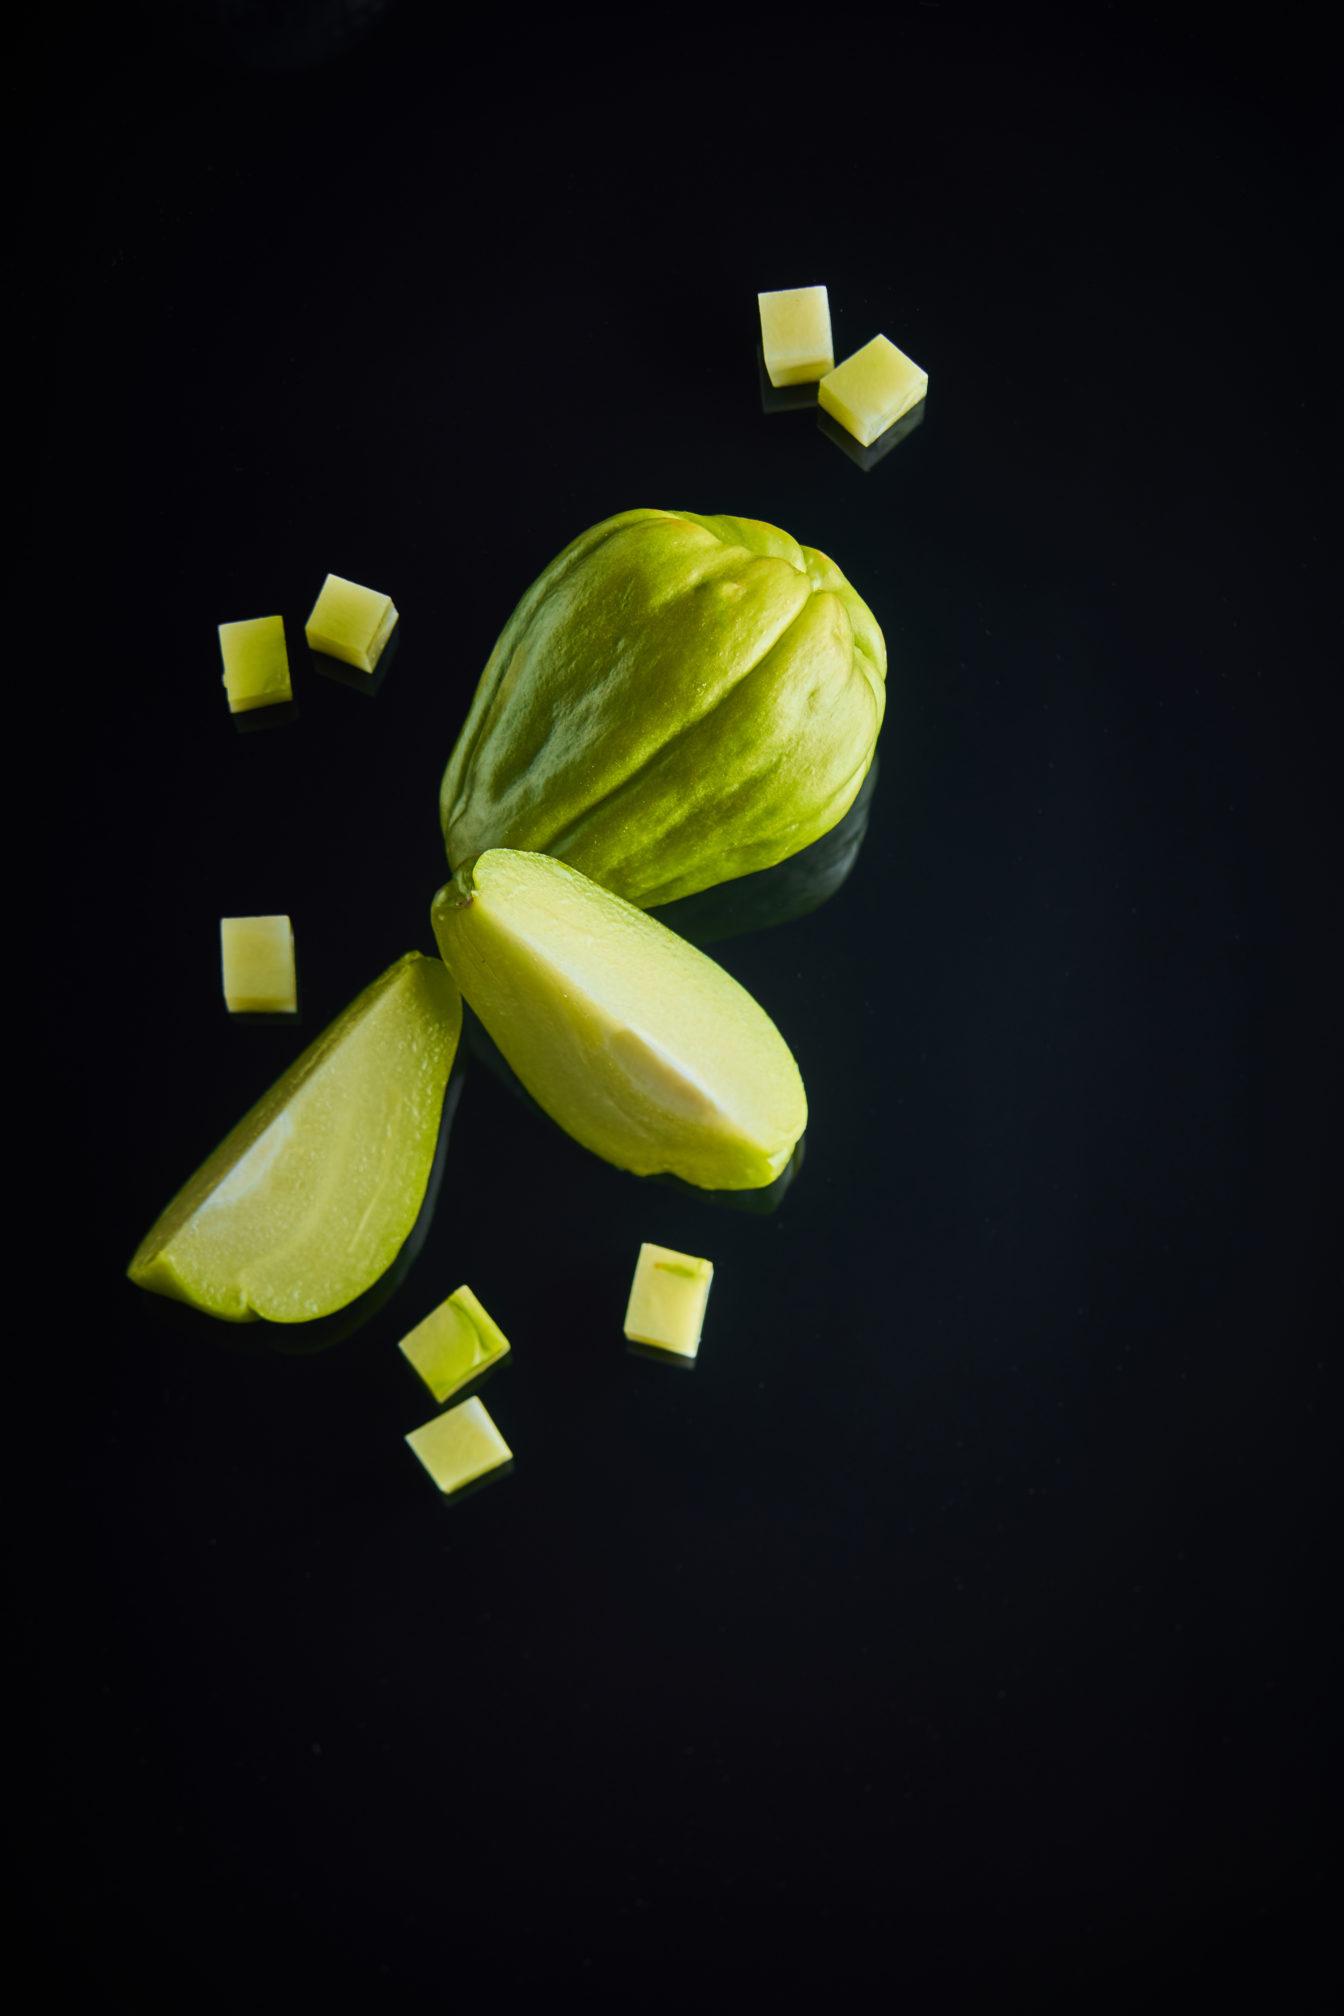 capexo-lilot-fruits-exotique-chayotte-france-costa-rica